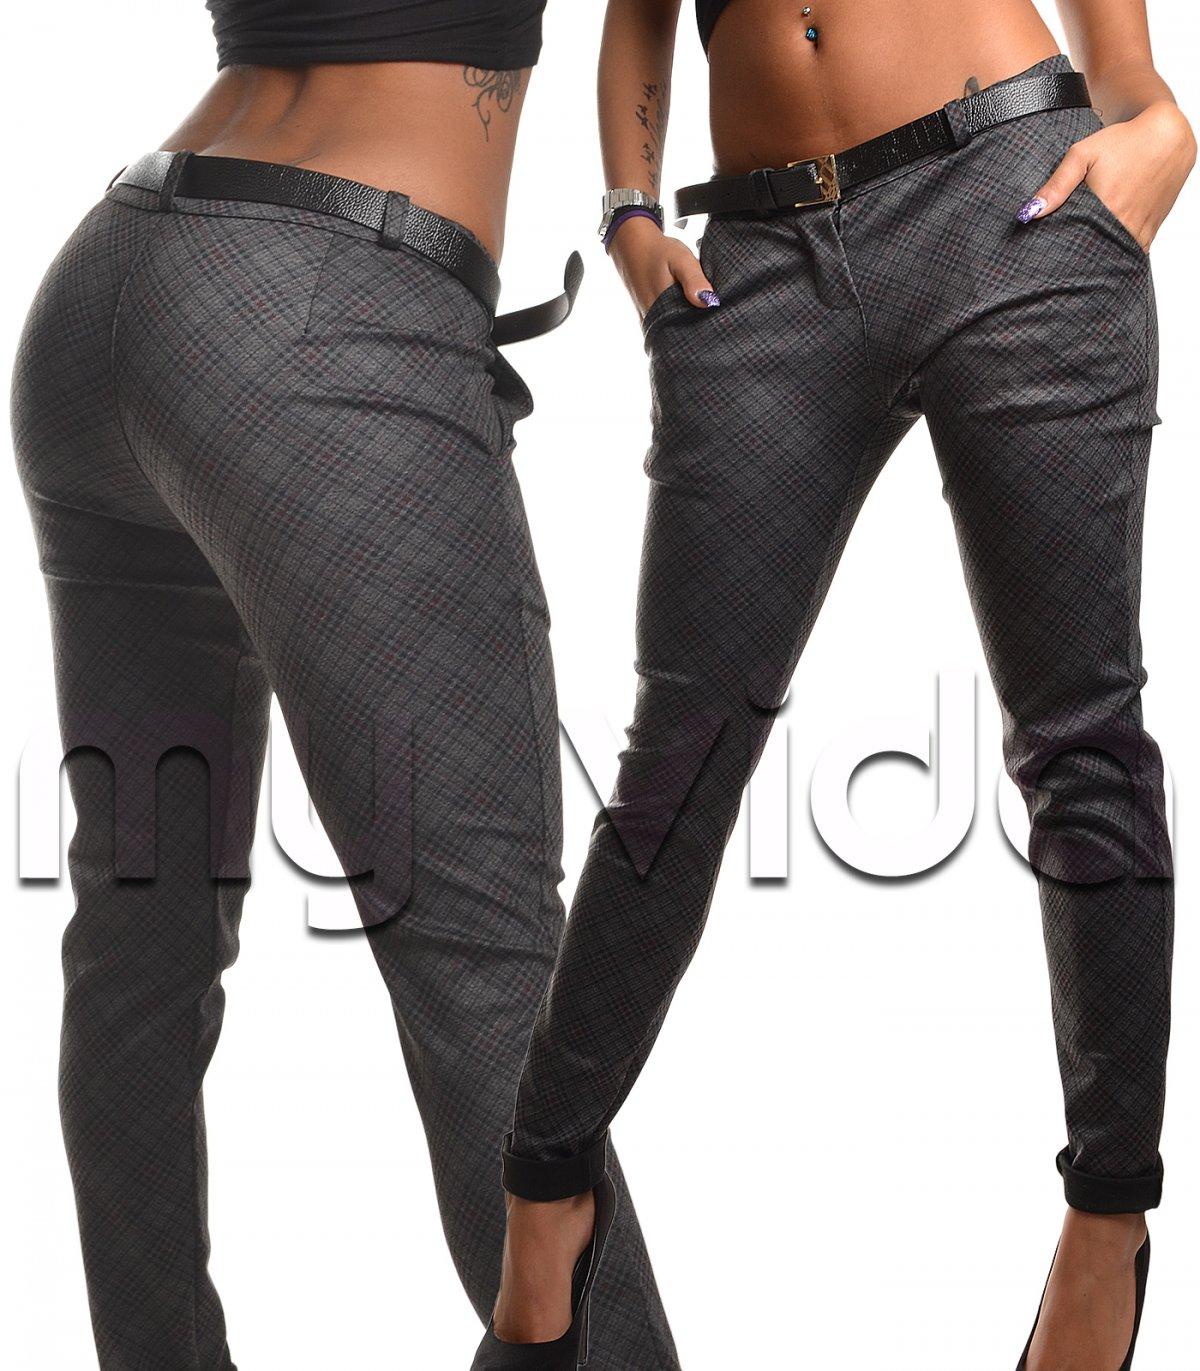 c2c8bb4386ee96 Pantaloni donna eleganti skinny slim scozzesi